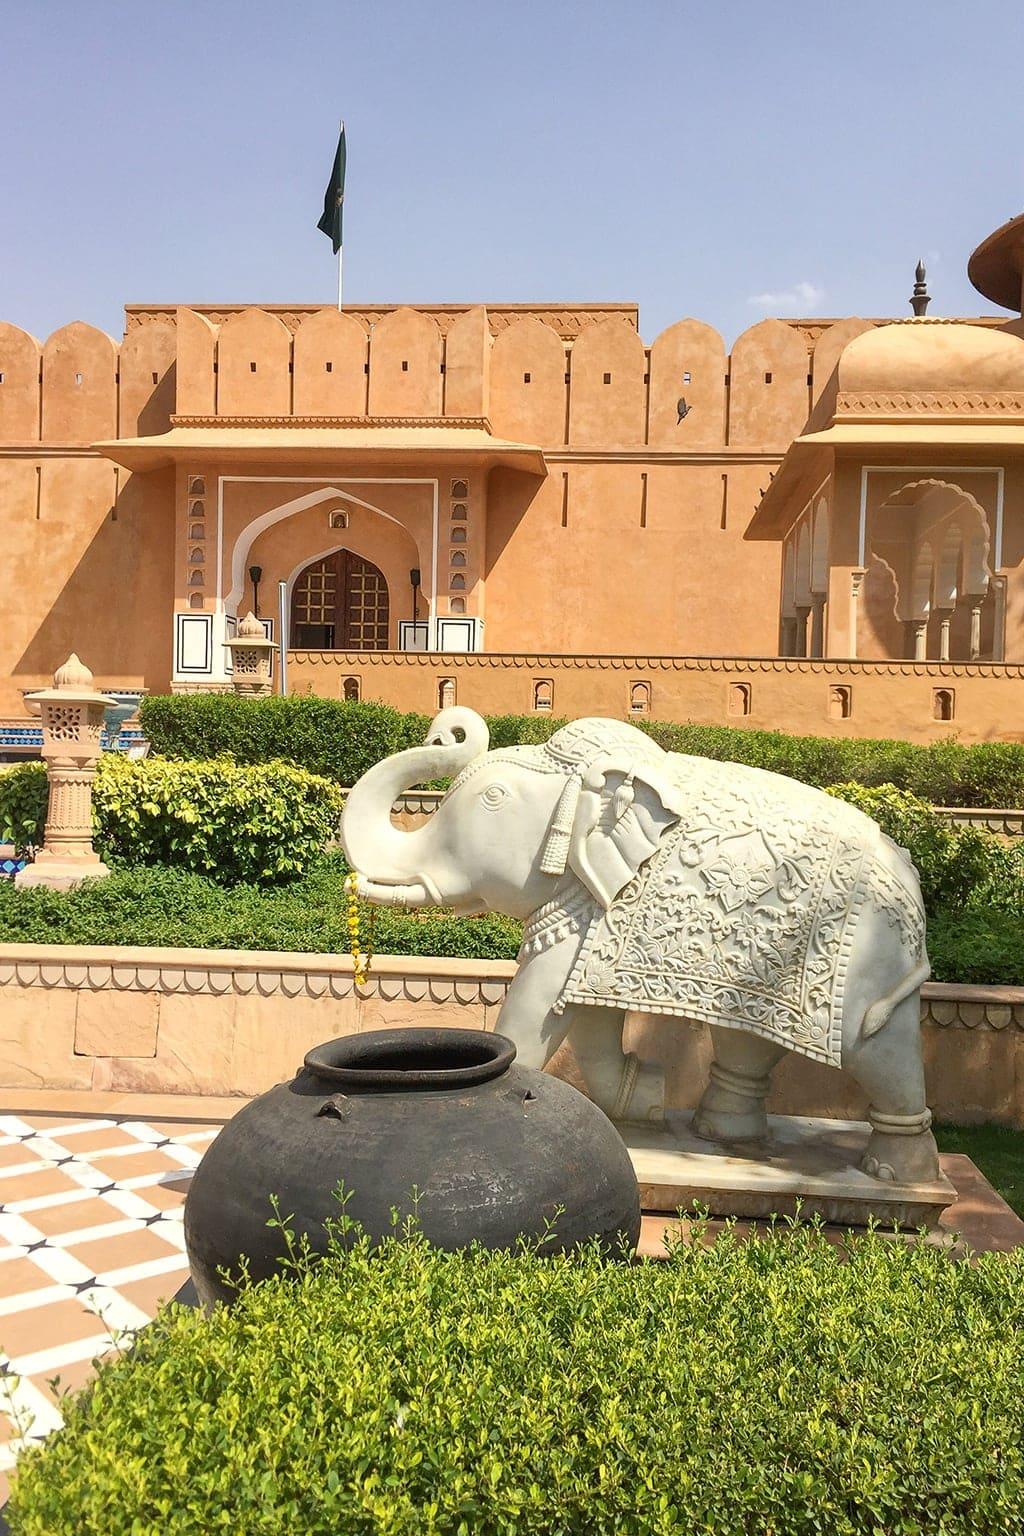 The Oberoi Rajvilās in Jaipur Rajasthan